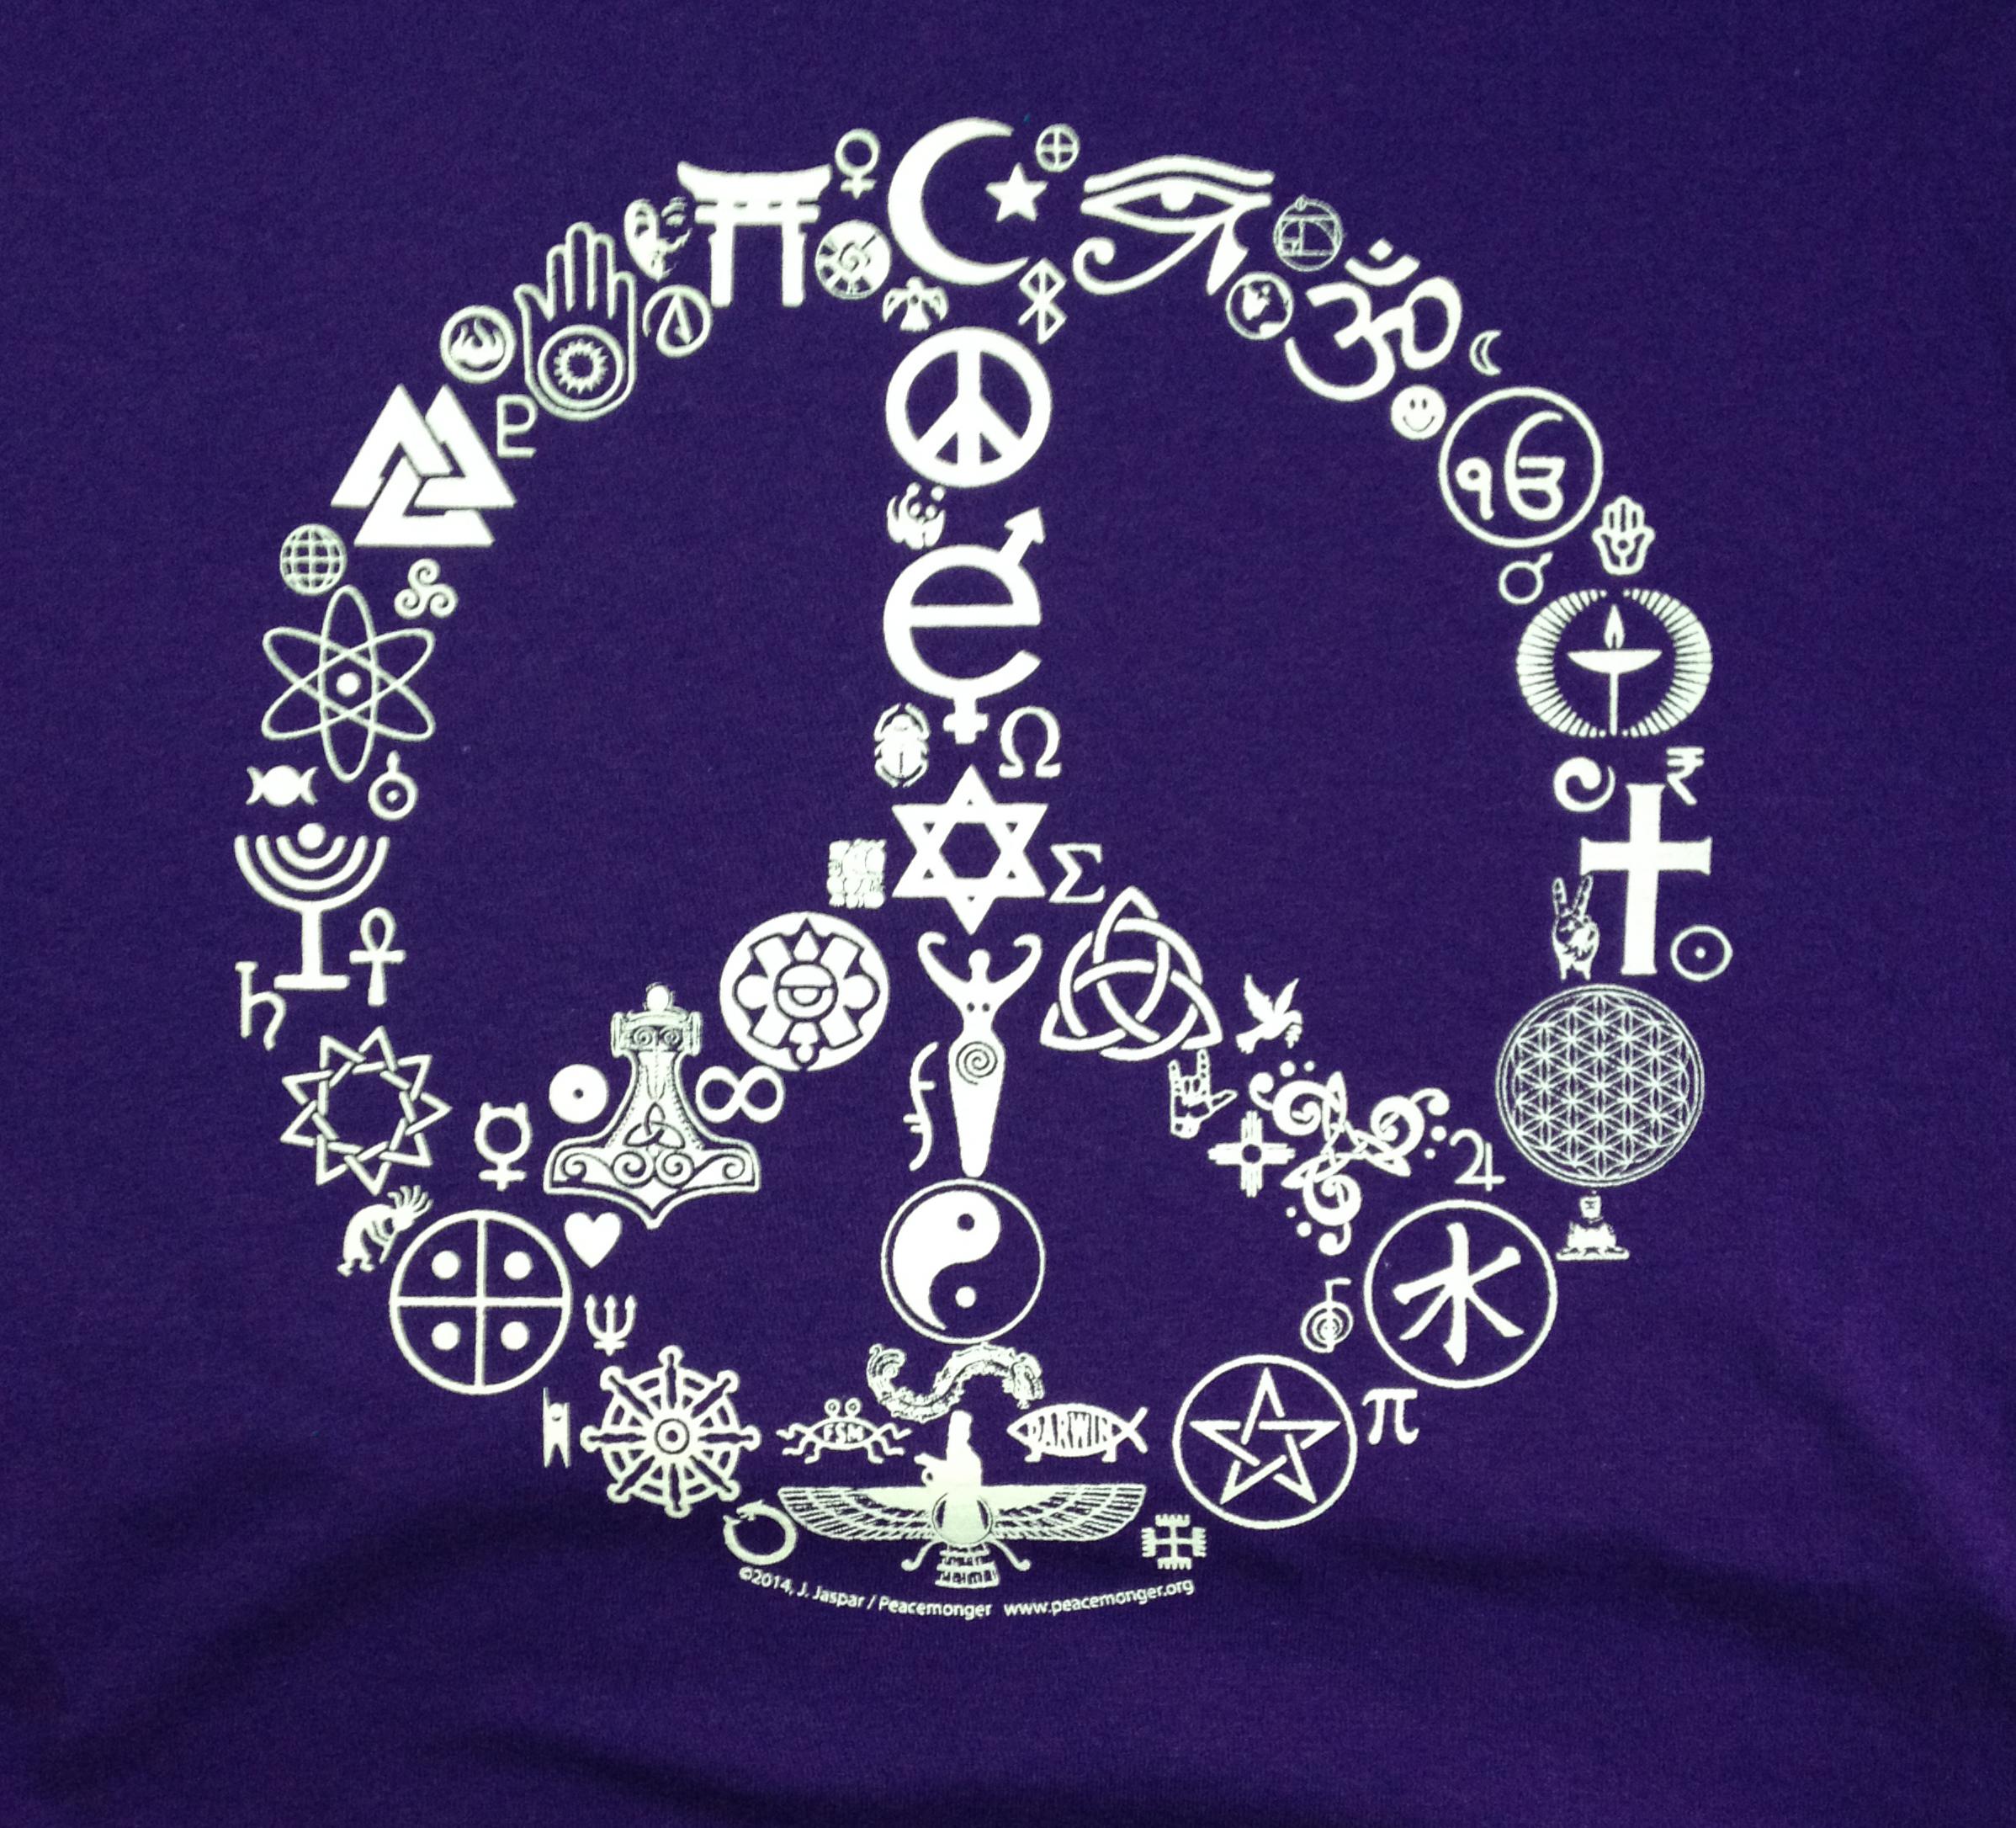 Coexist symbols